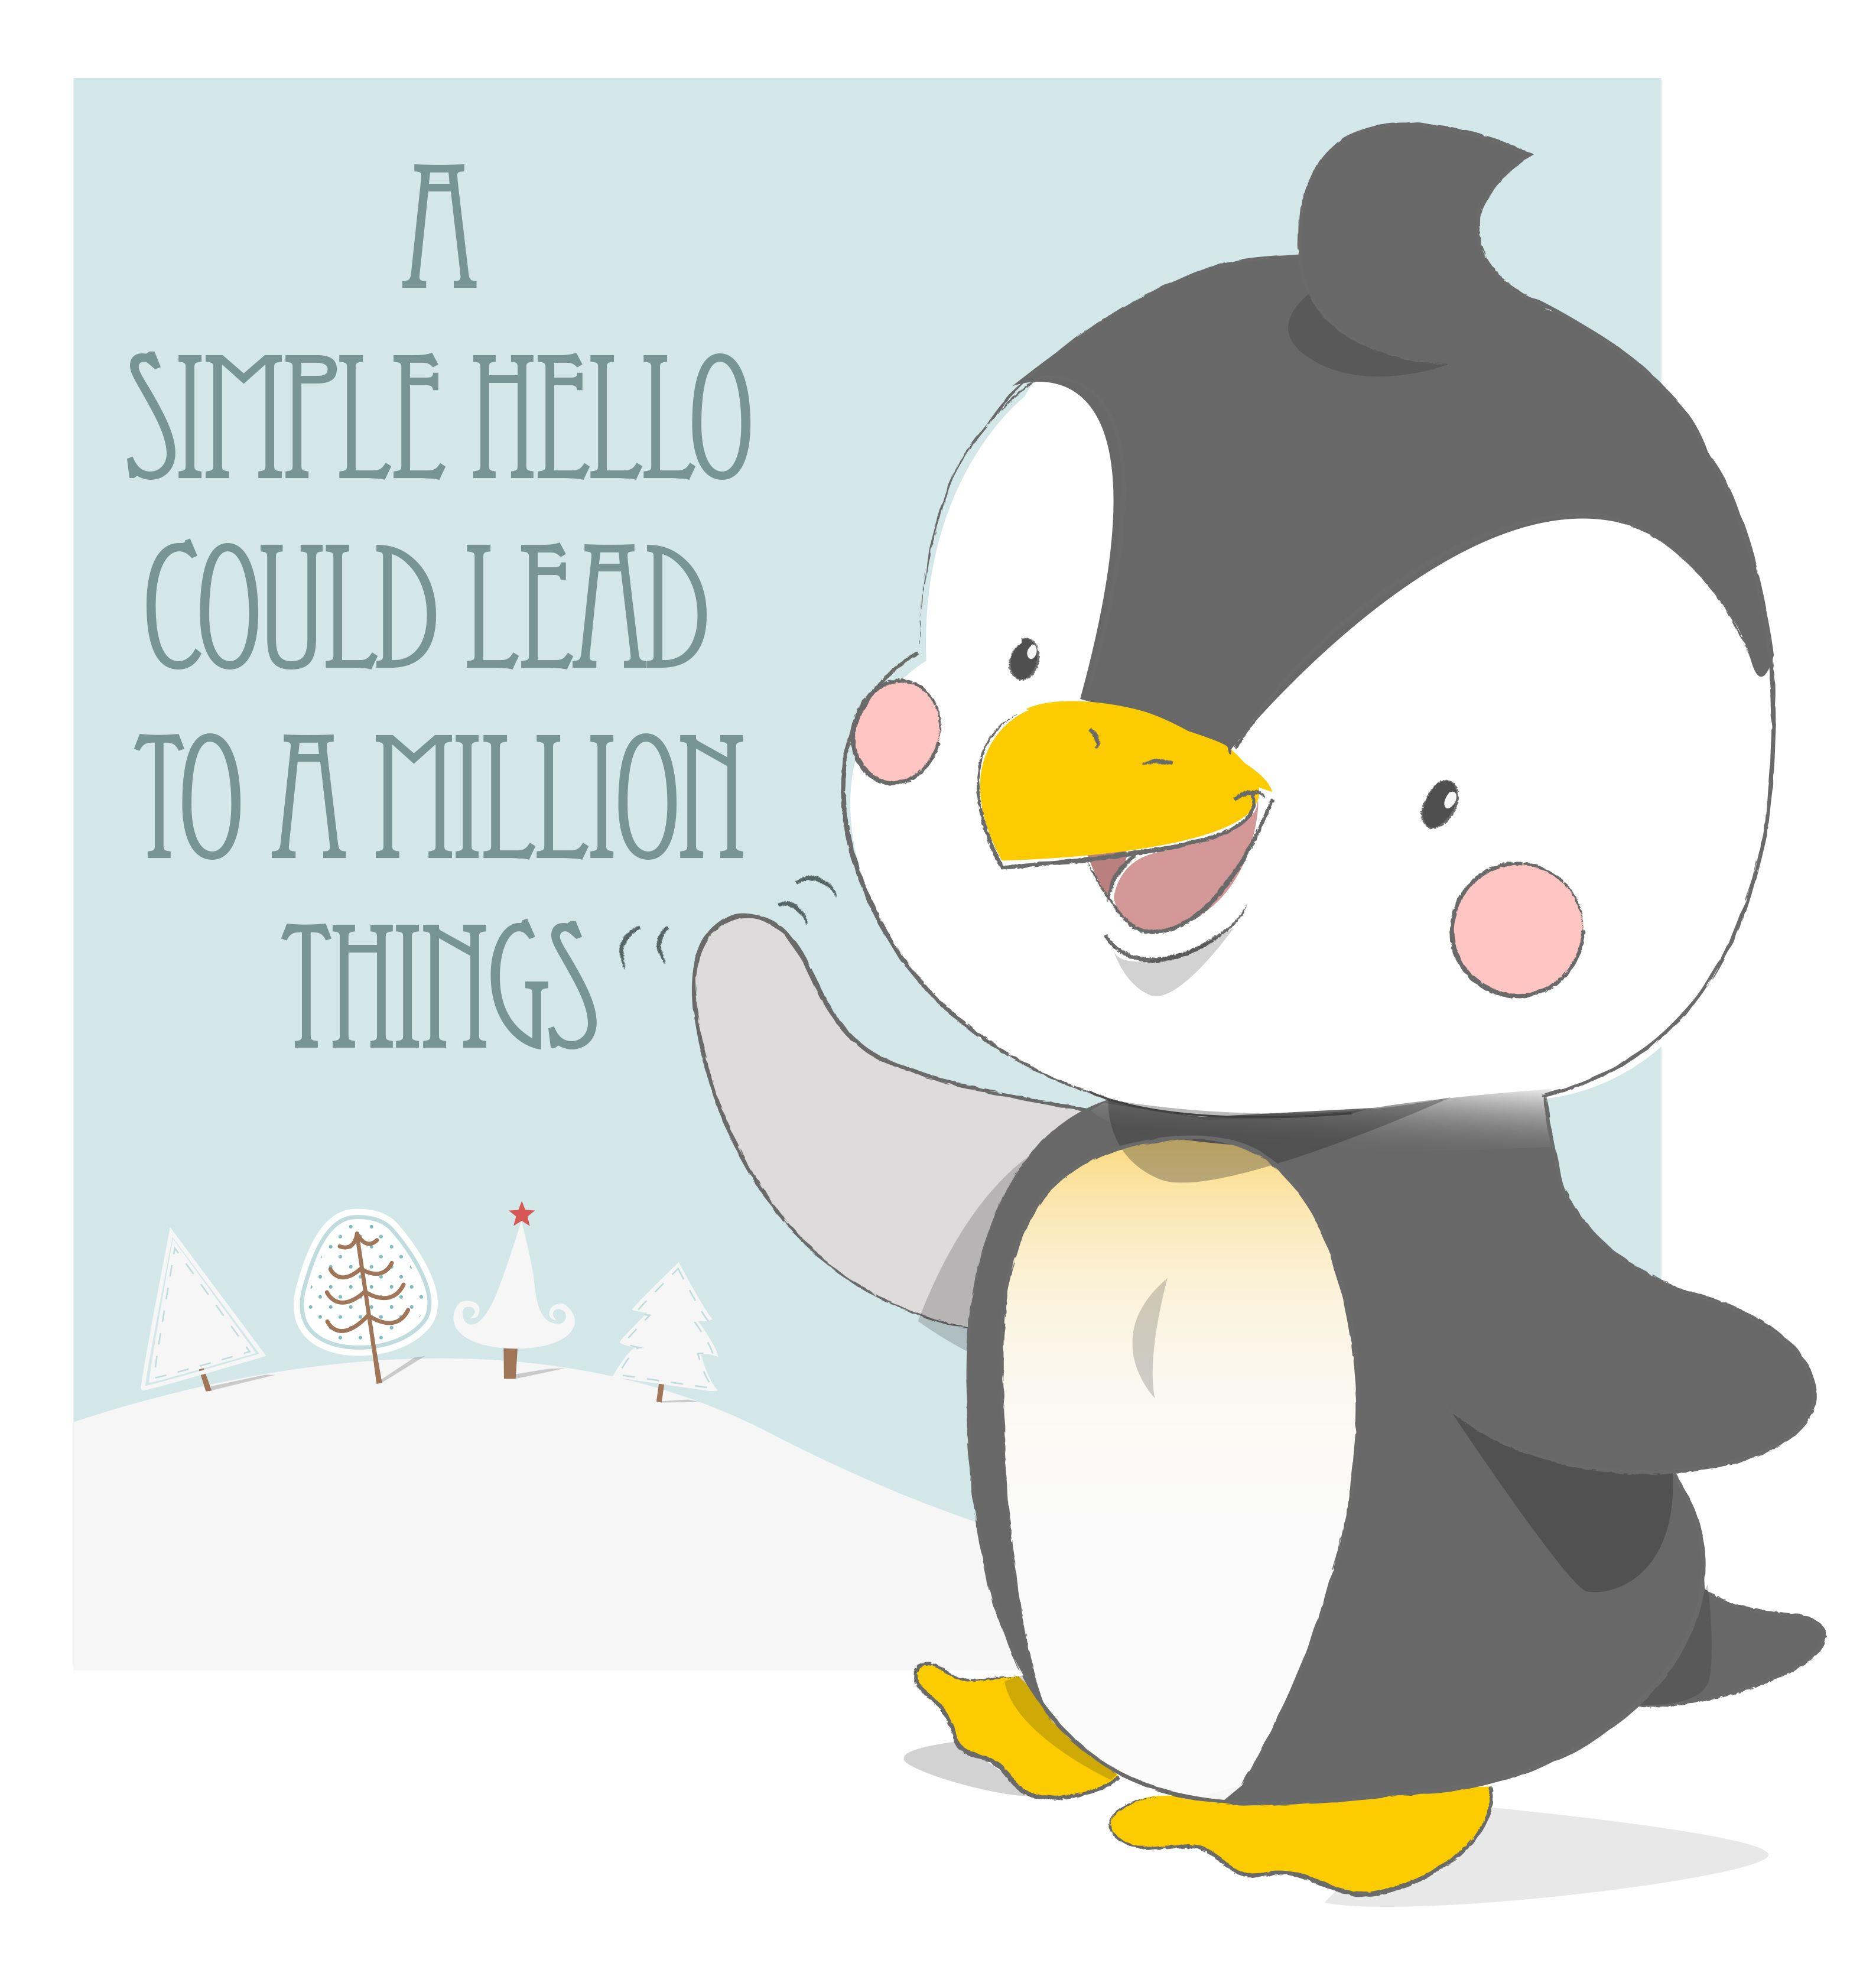 World Hello Day ) Hello Positive words, Positivity, Words